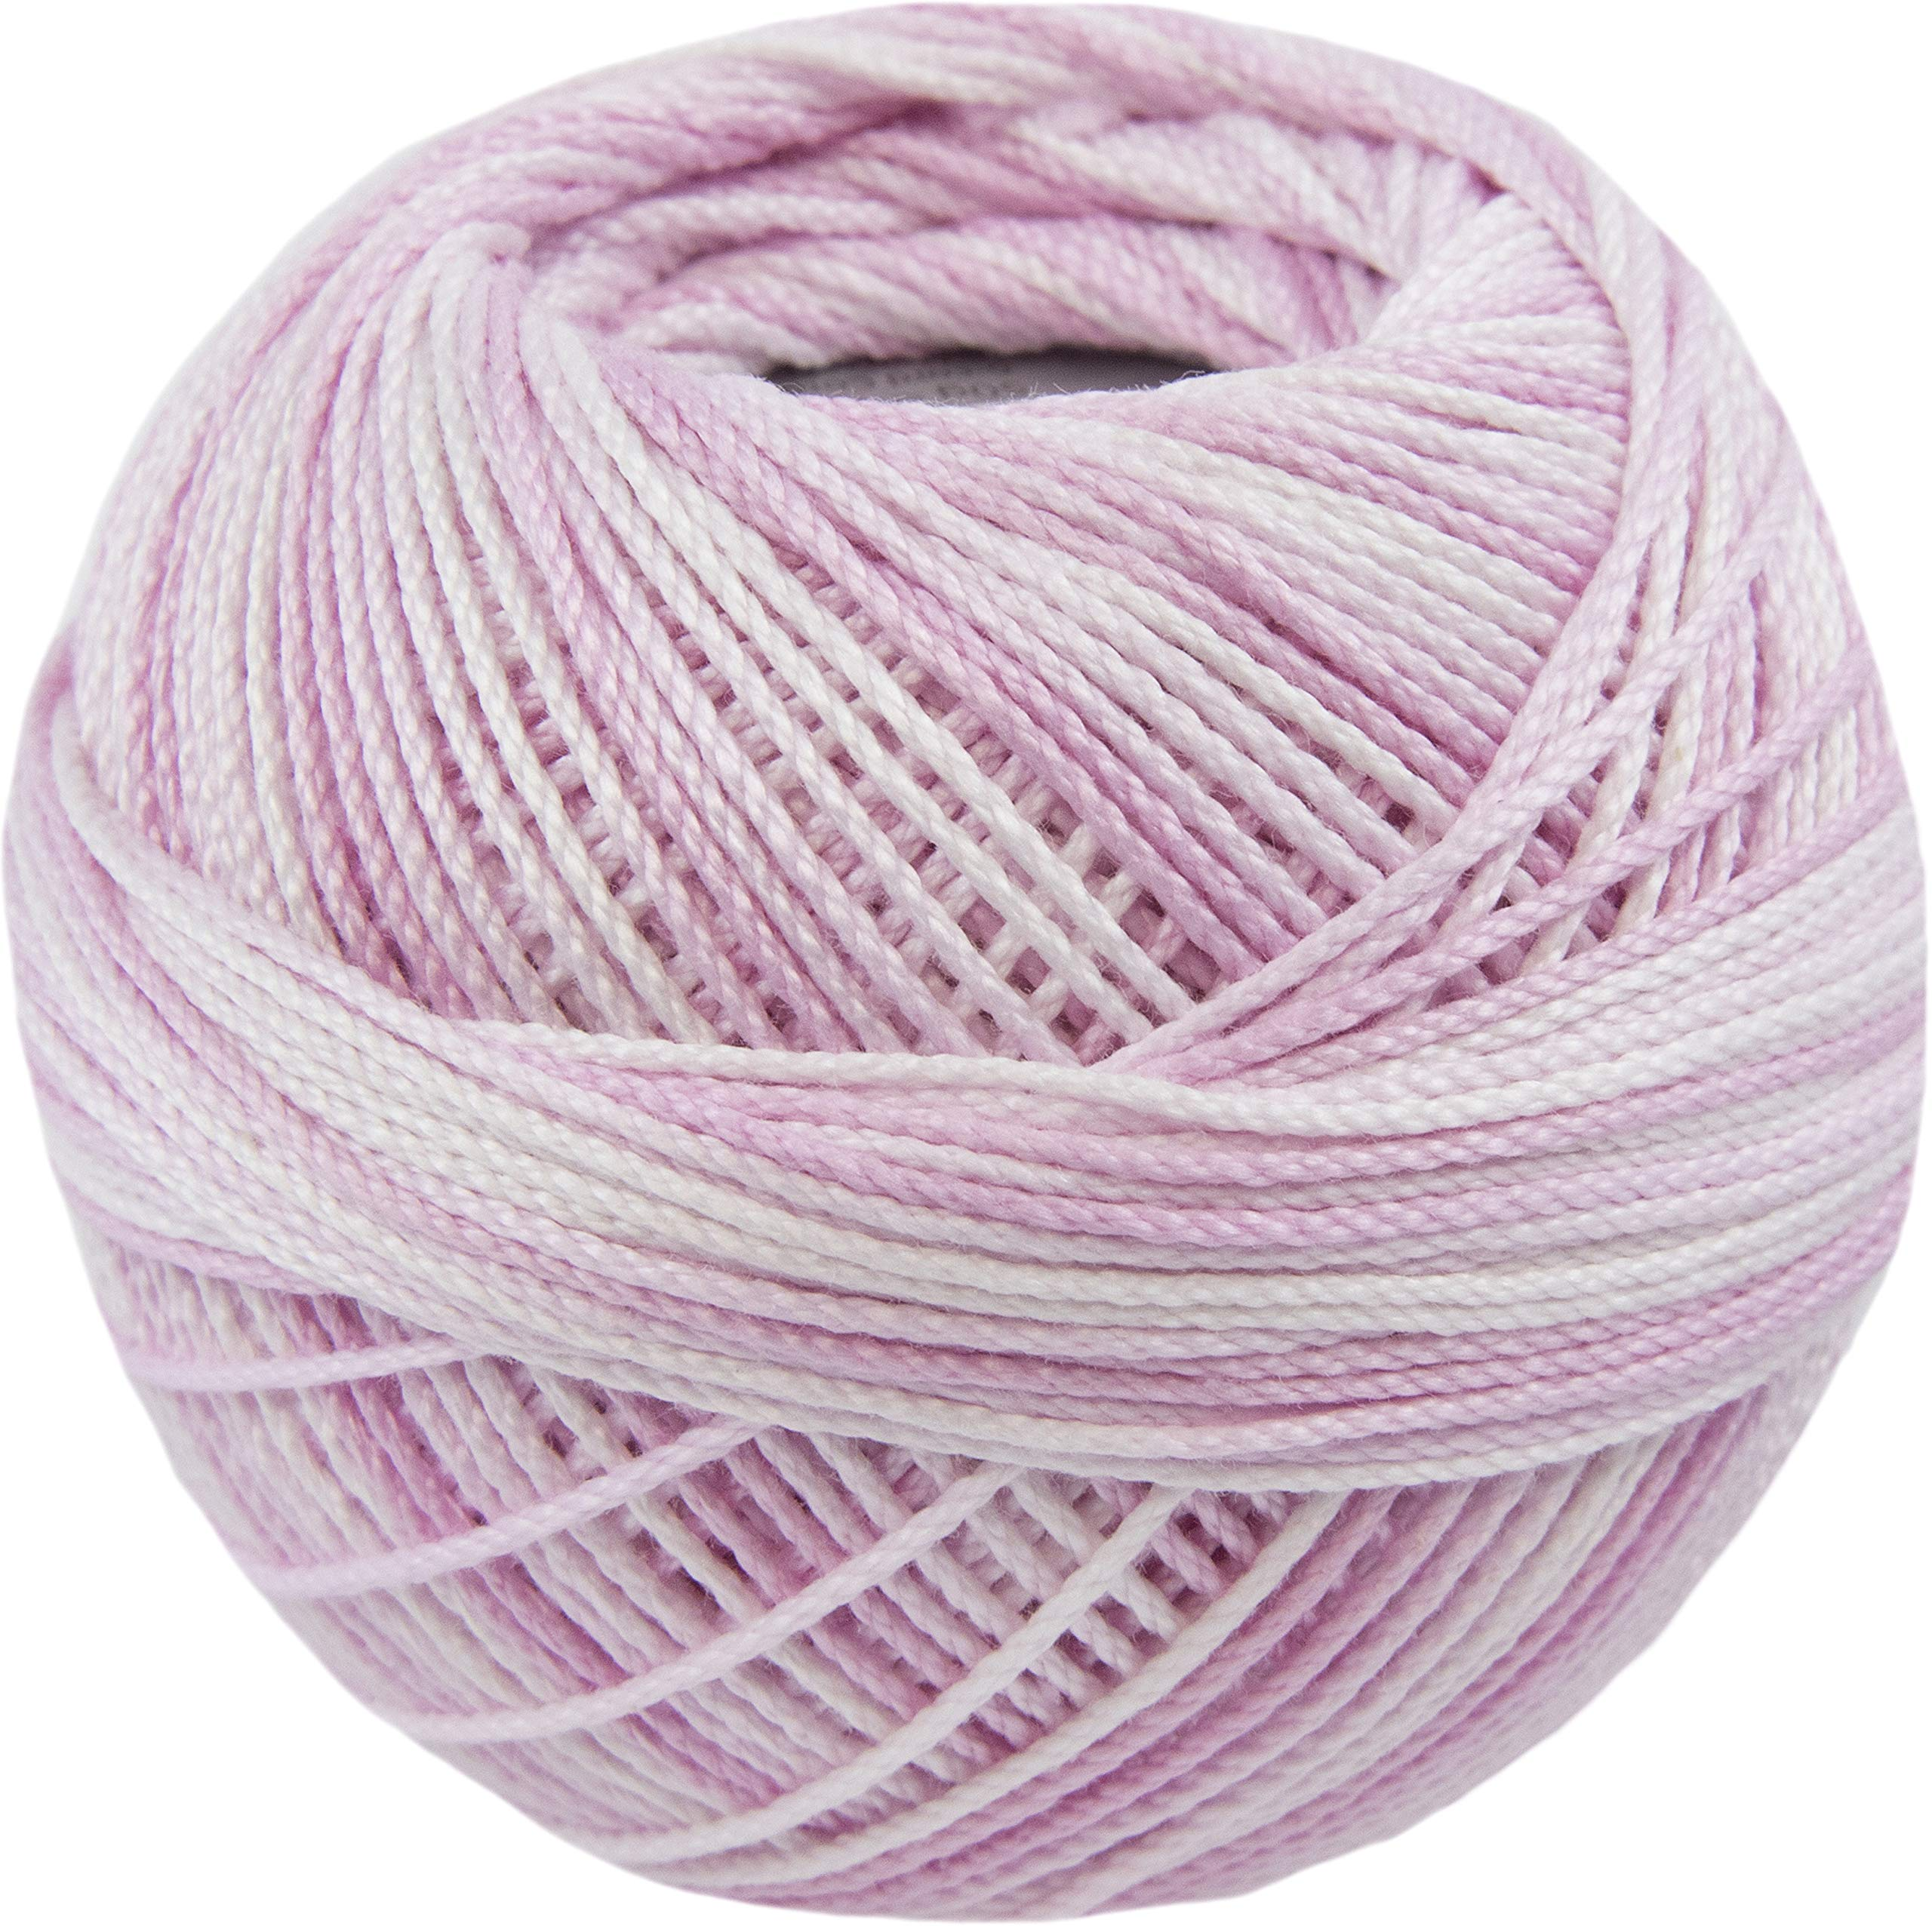 Handy Hands Lizbeth Cordonnet Cotton Size 3-Pink Ice